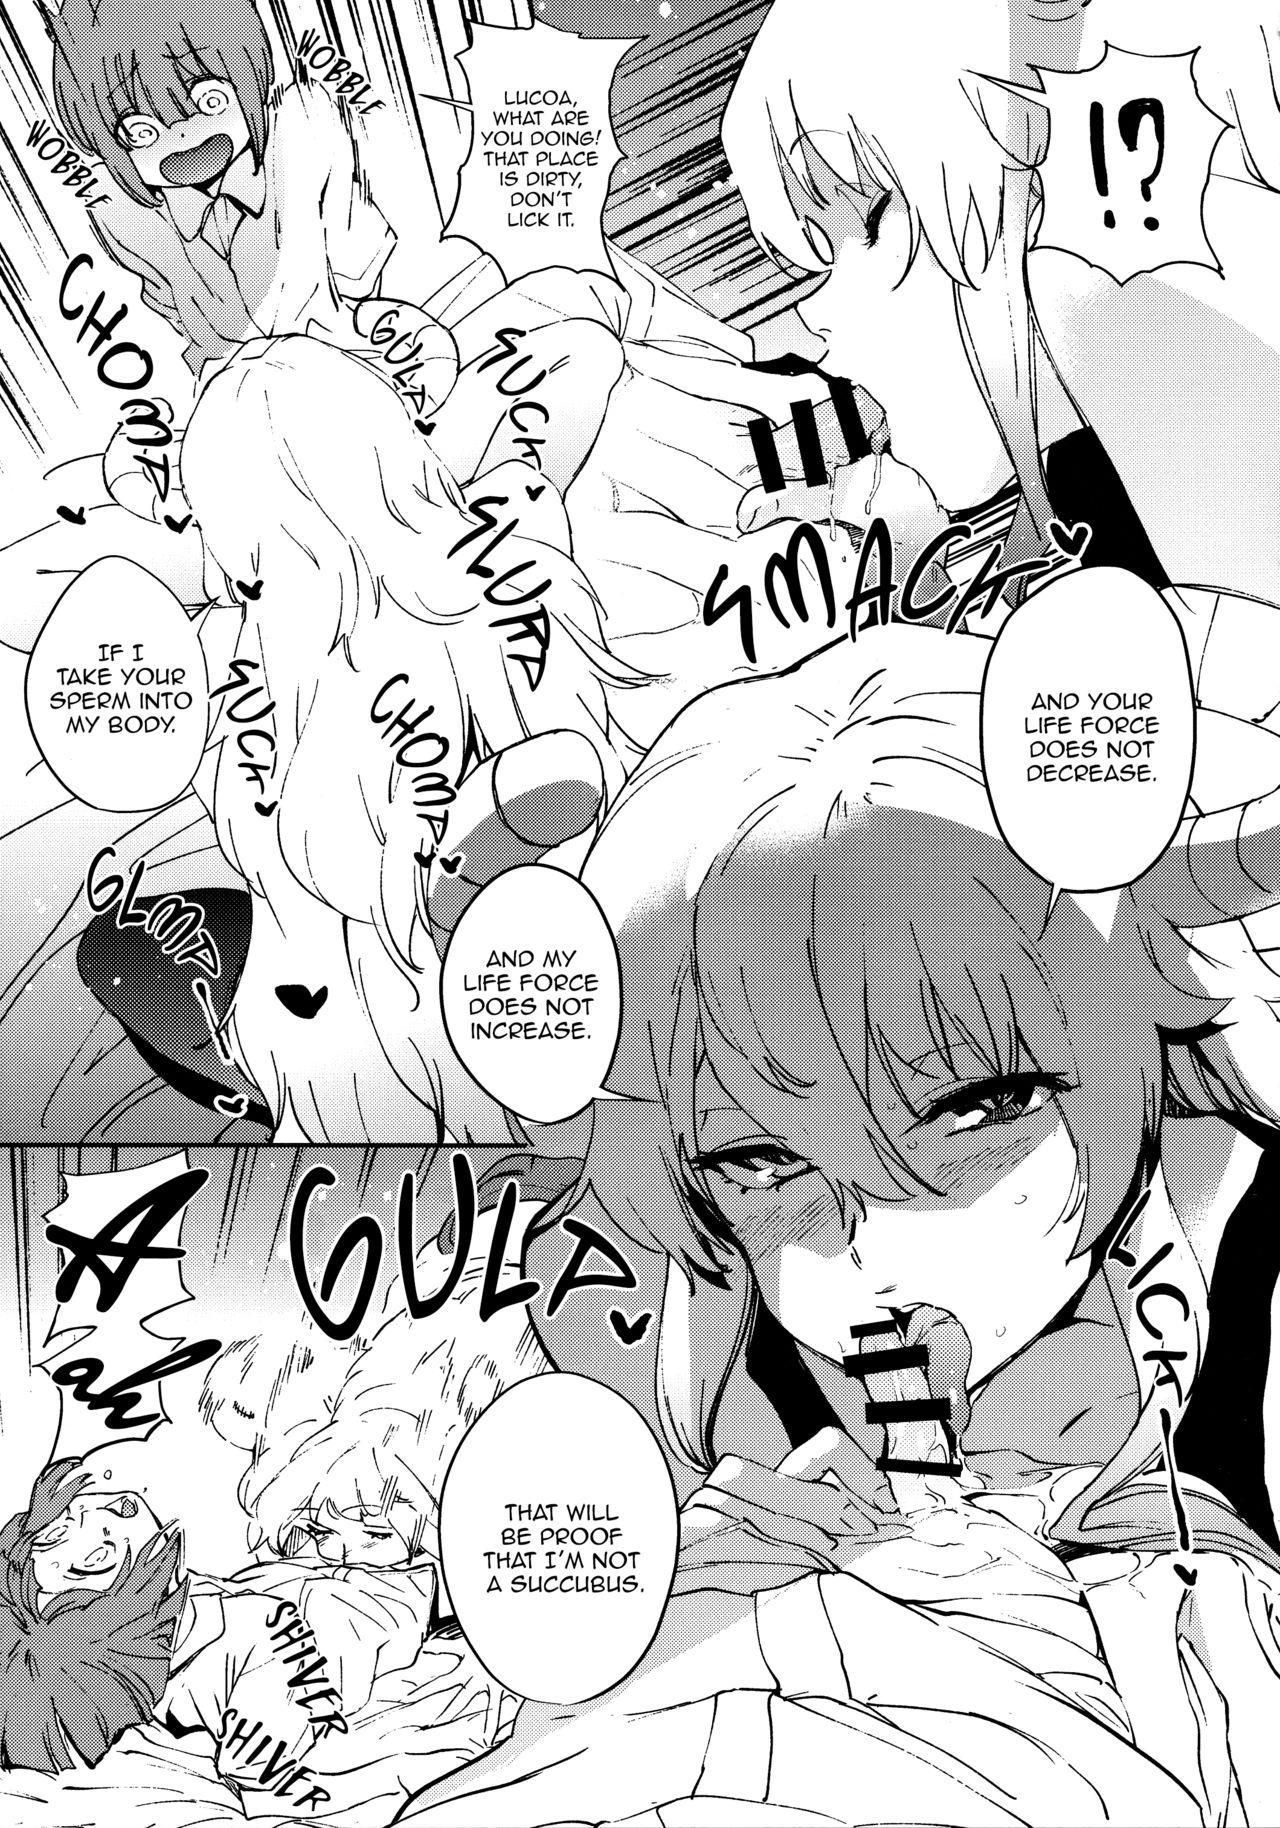 Ishukan Hatsujou Chijogons | One Week in Heat, Slutty Dragons 7